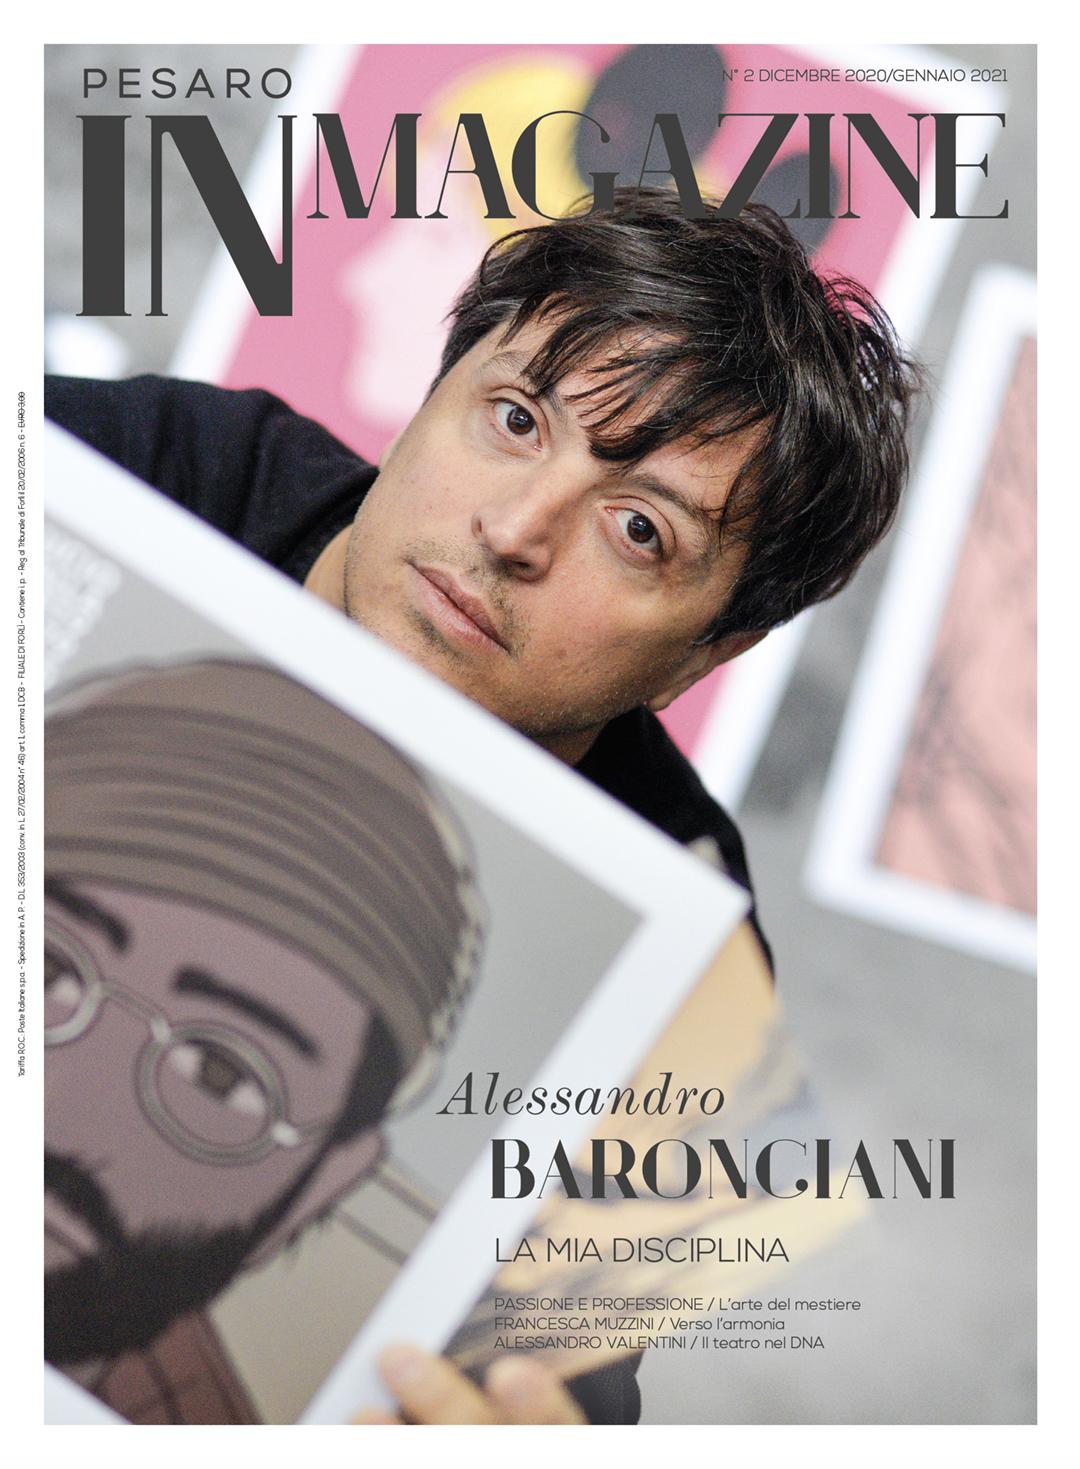 Alessandro Baronciani in copertina di Pesaro IN Magazine n. 2/2020